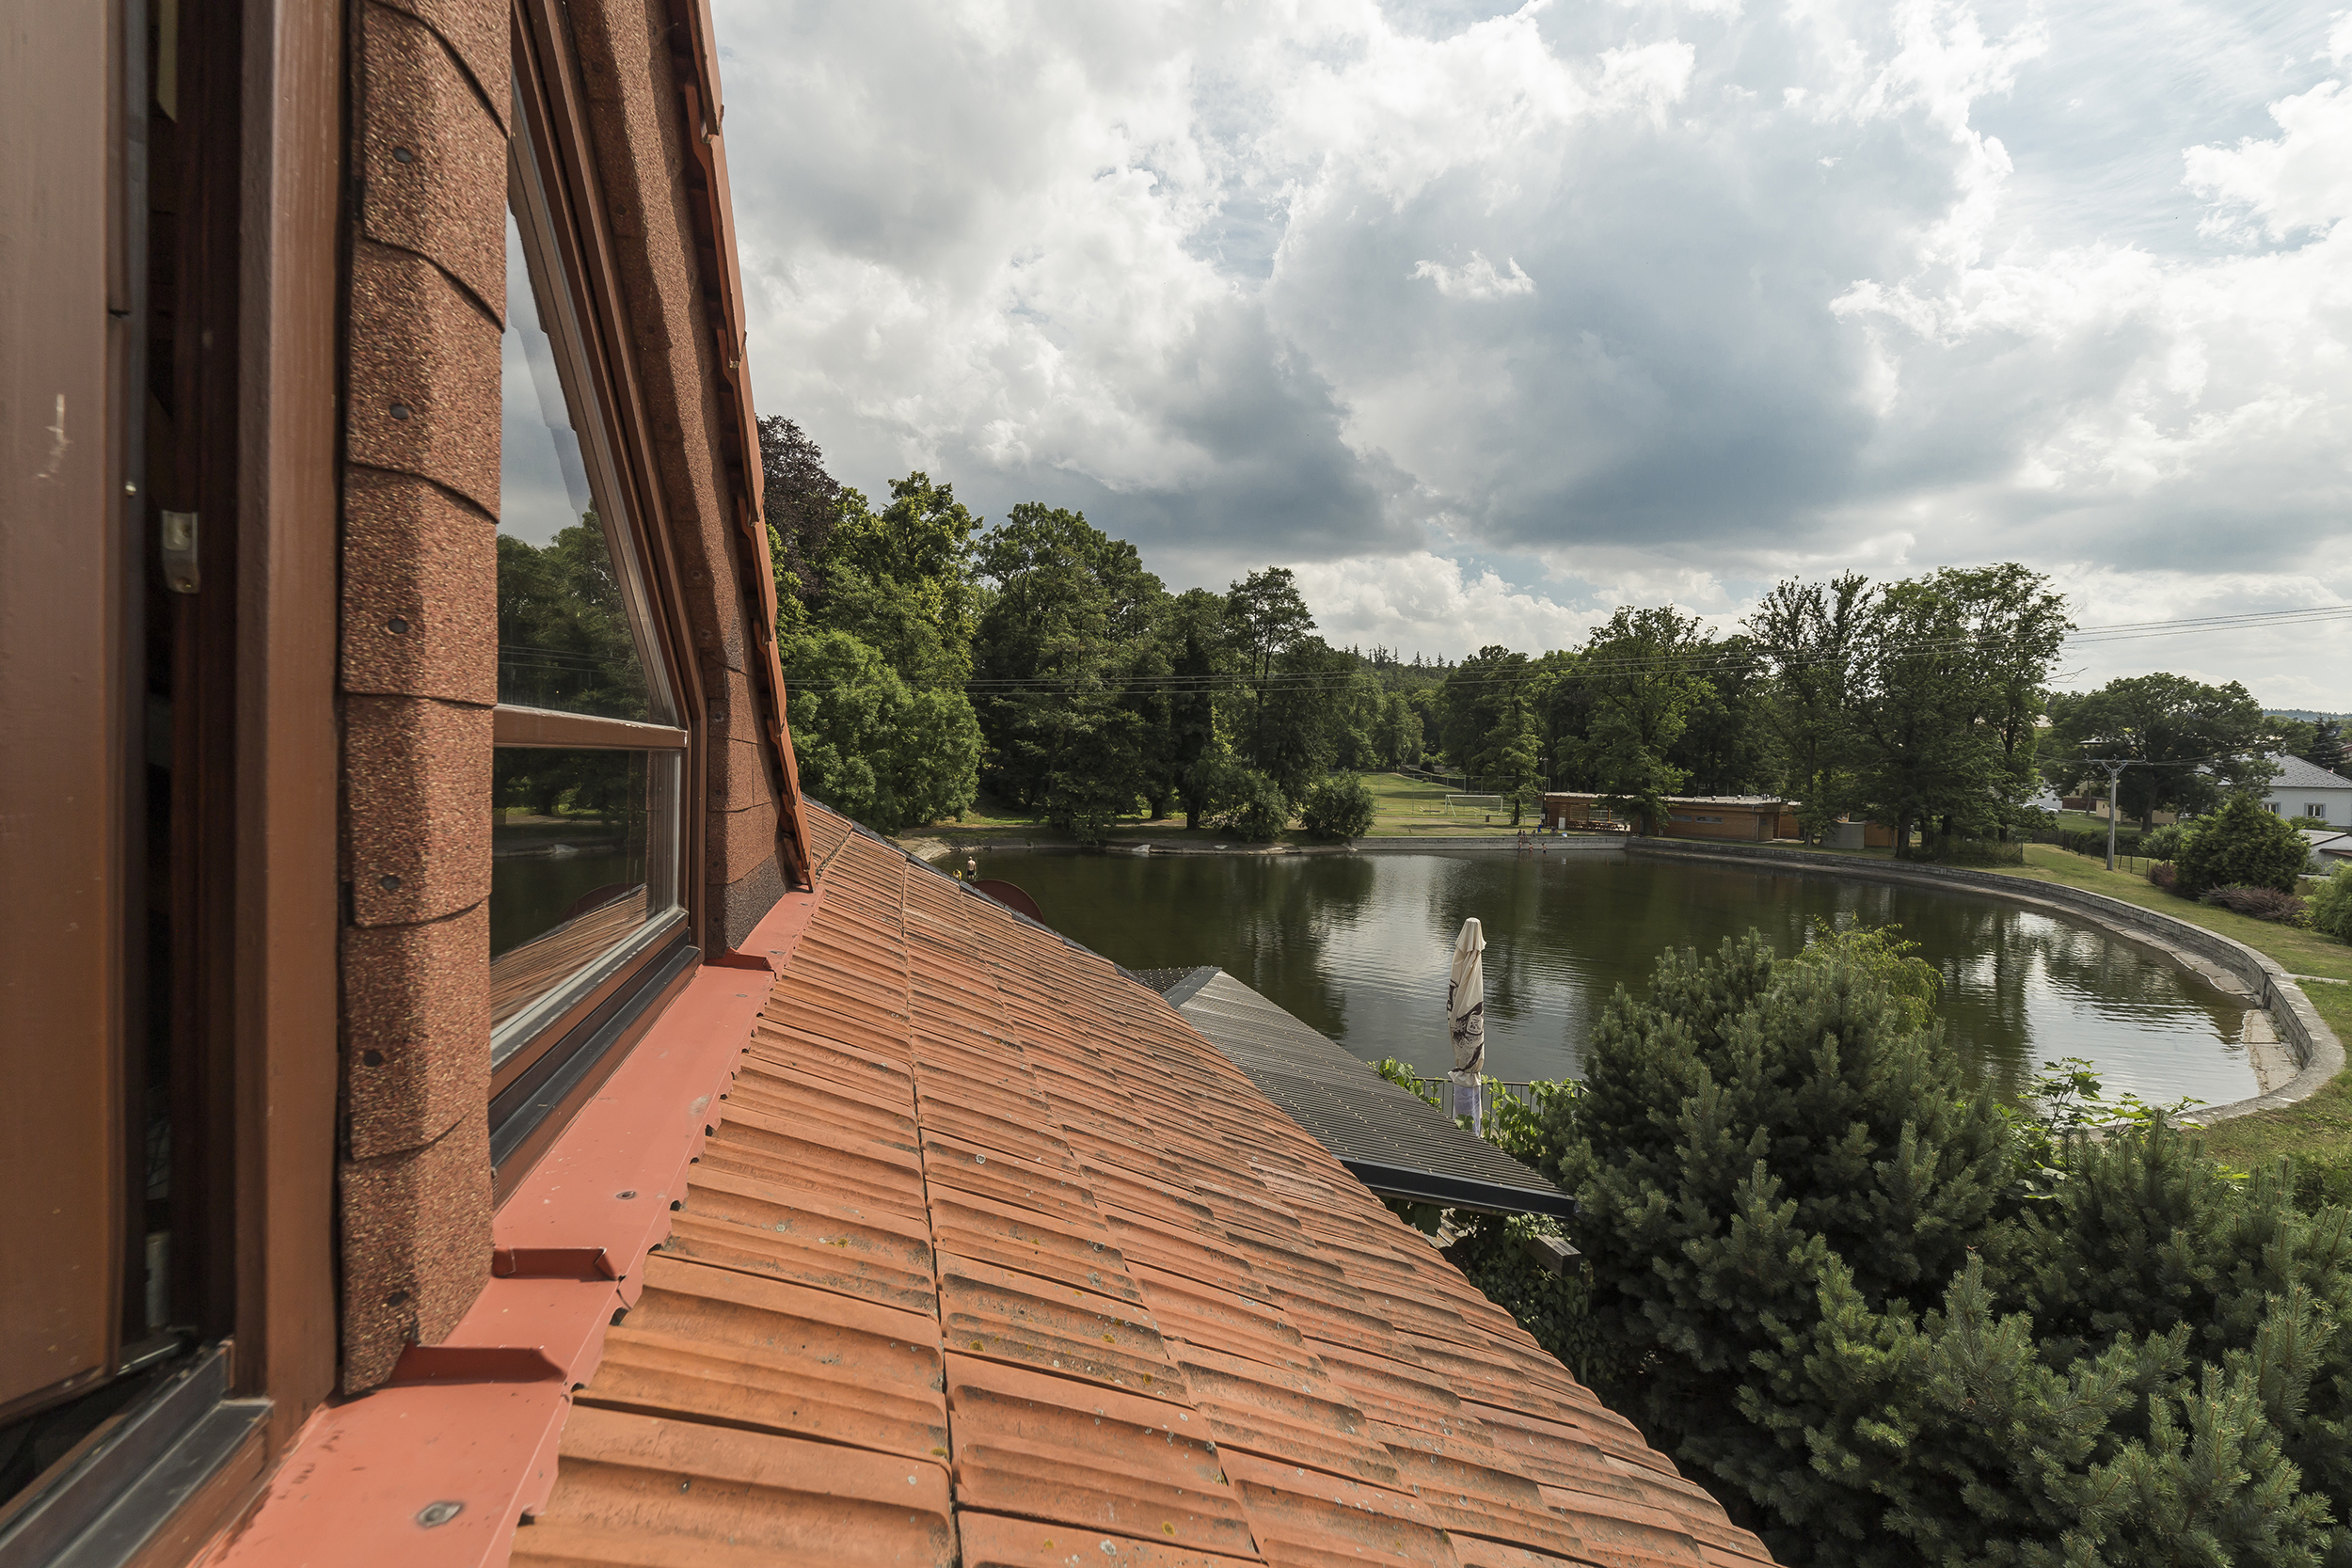 puda okno rybnik strom nebe mrak voda vyhled okno strecha radunka prodej domu radun linda bittova